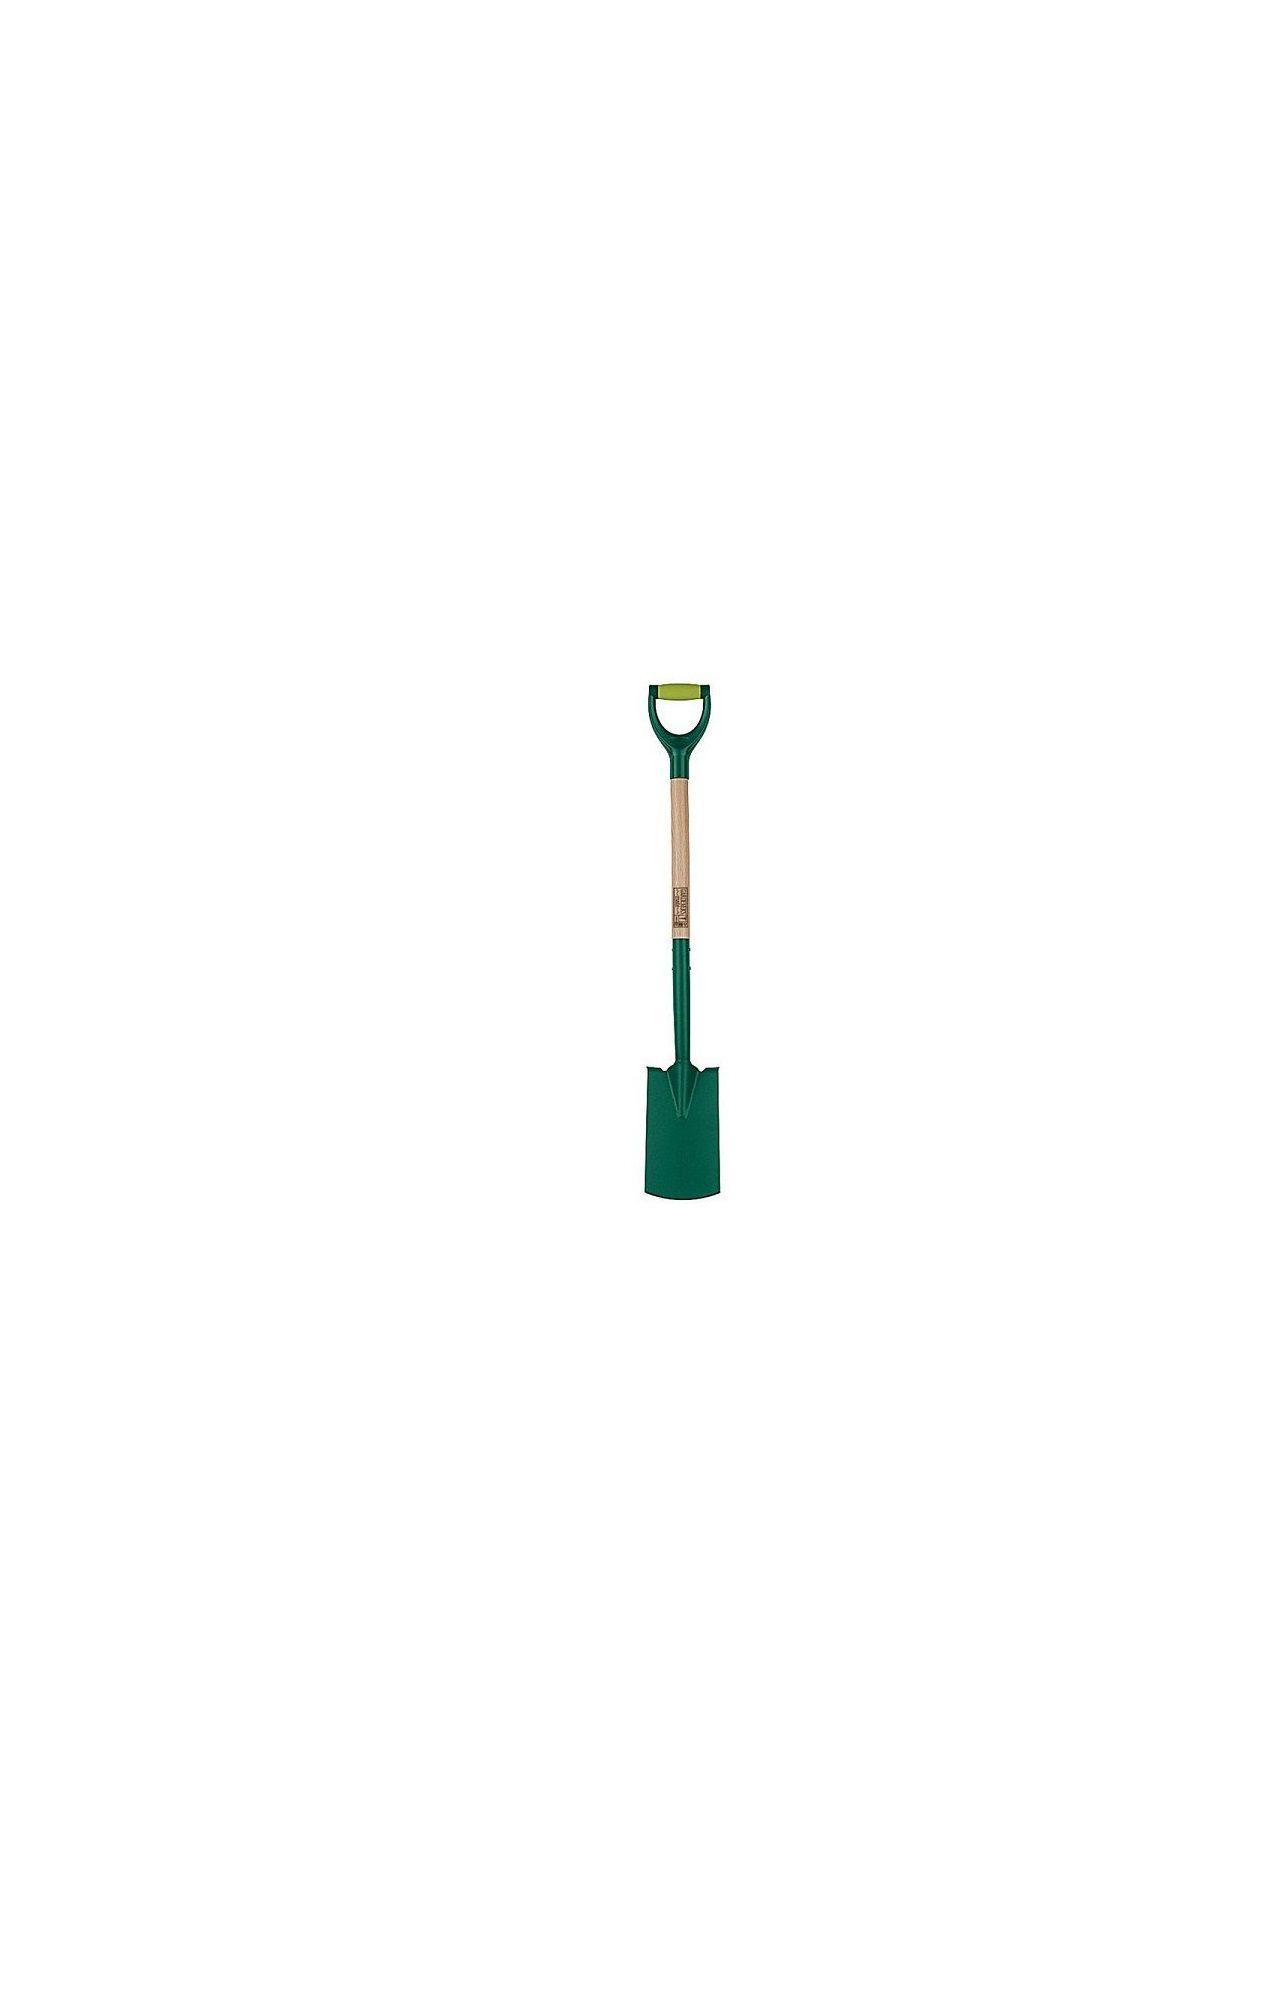 Gardeners Mate Border Spade 94005